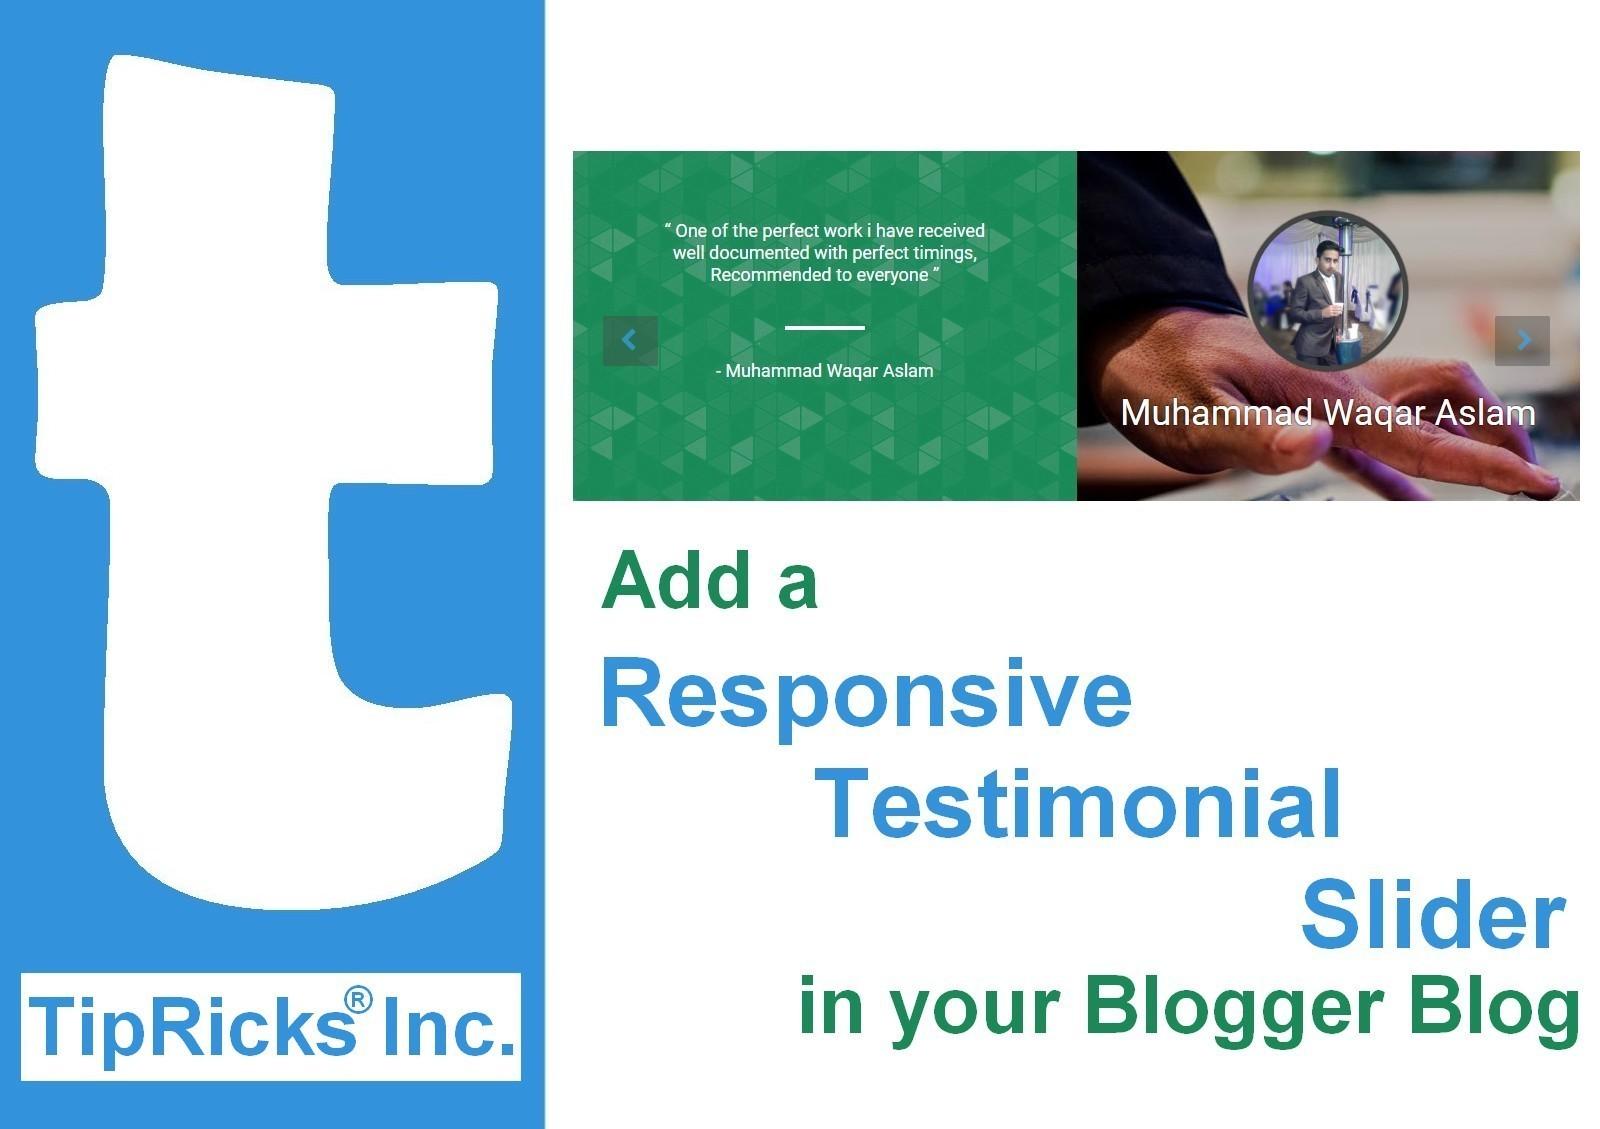 Add a Responsive Testimonial Slider in Your Blog/Website